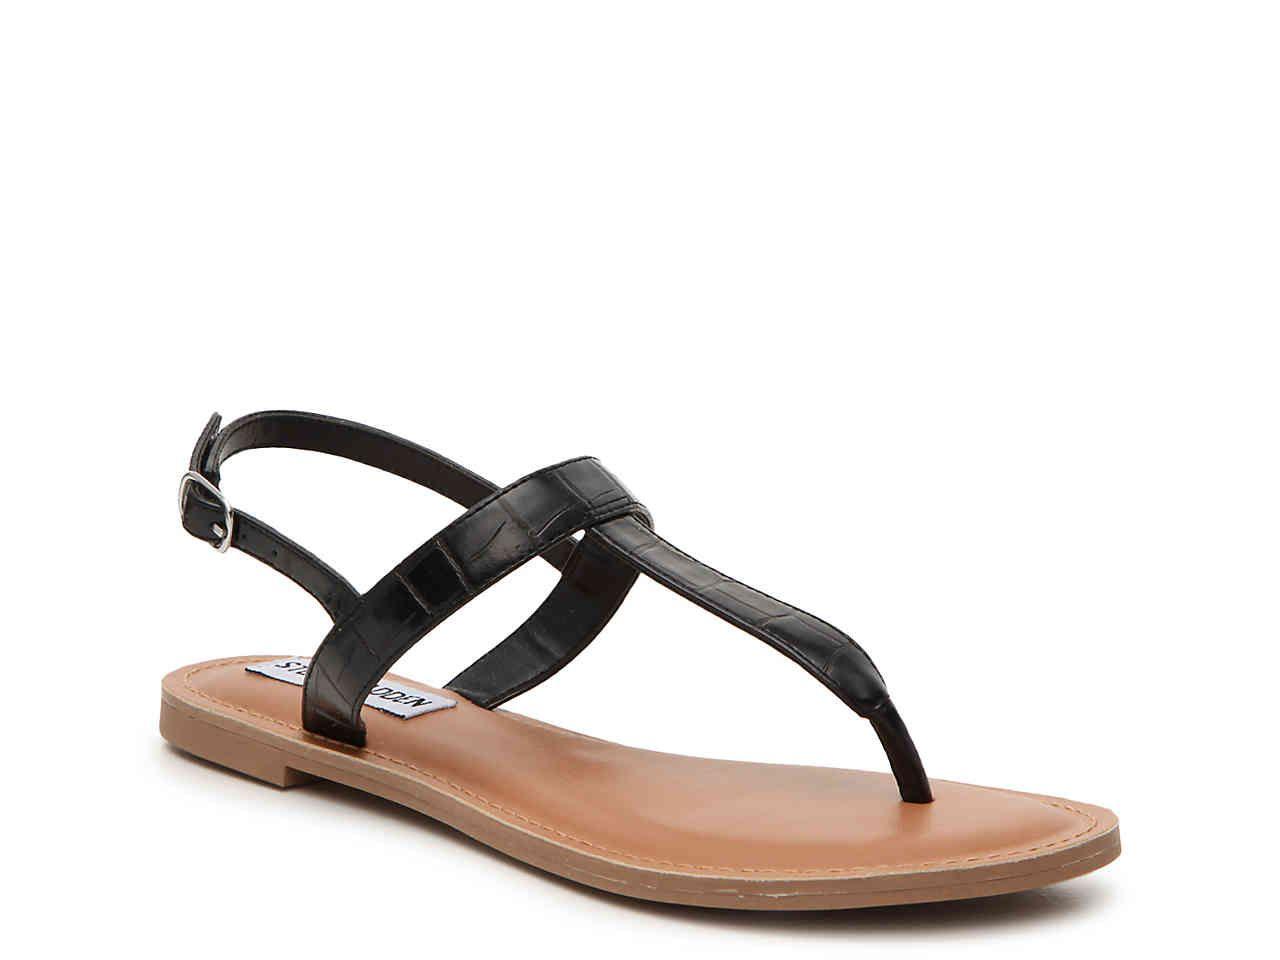 Steve Madden Lanza Sandal Women's Shoes